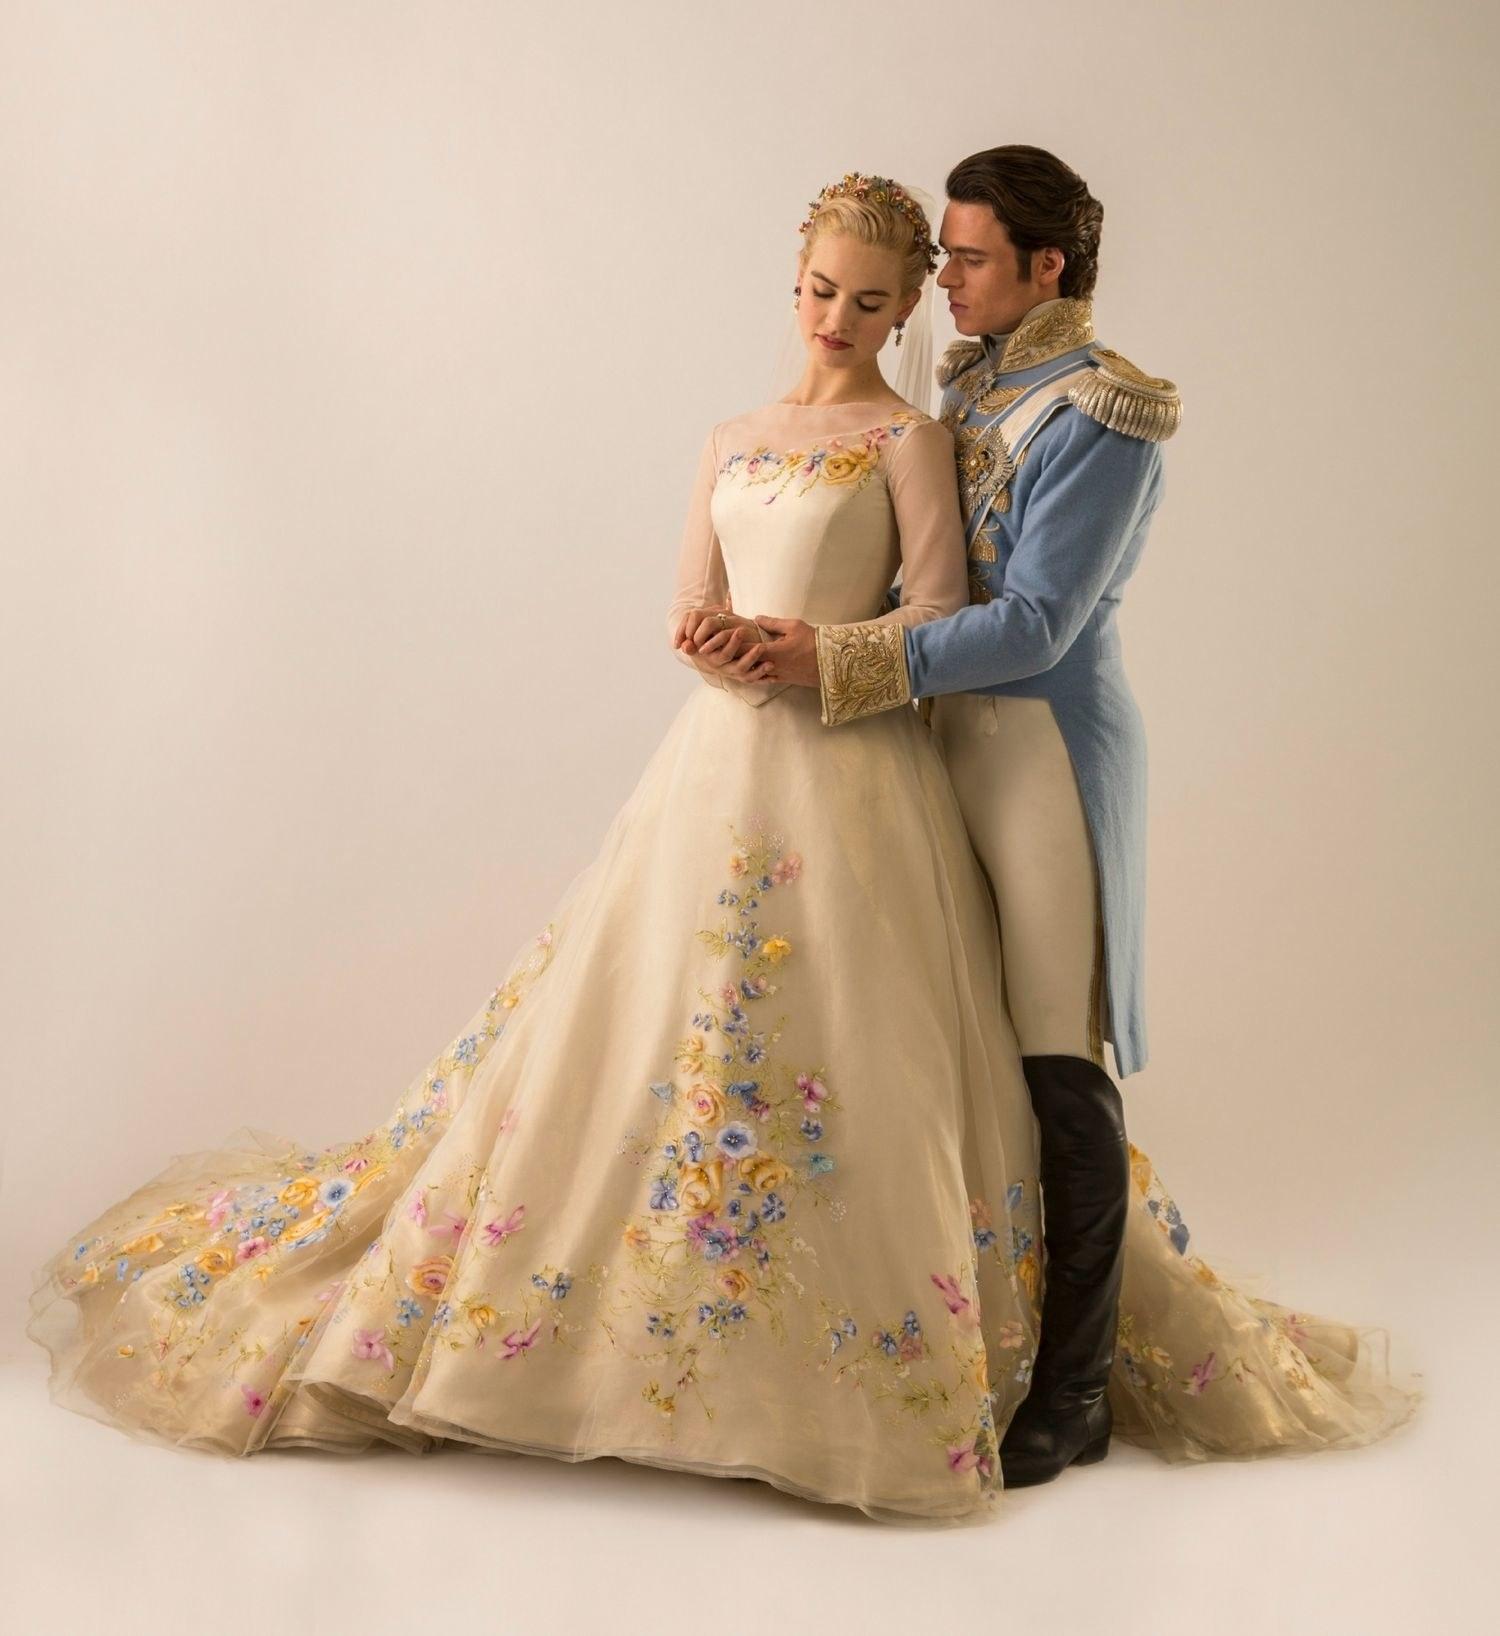 Cinderella Wedding Dress Up Games Online White Camo: Image - Cinderella With Prince Kit.png